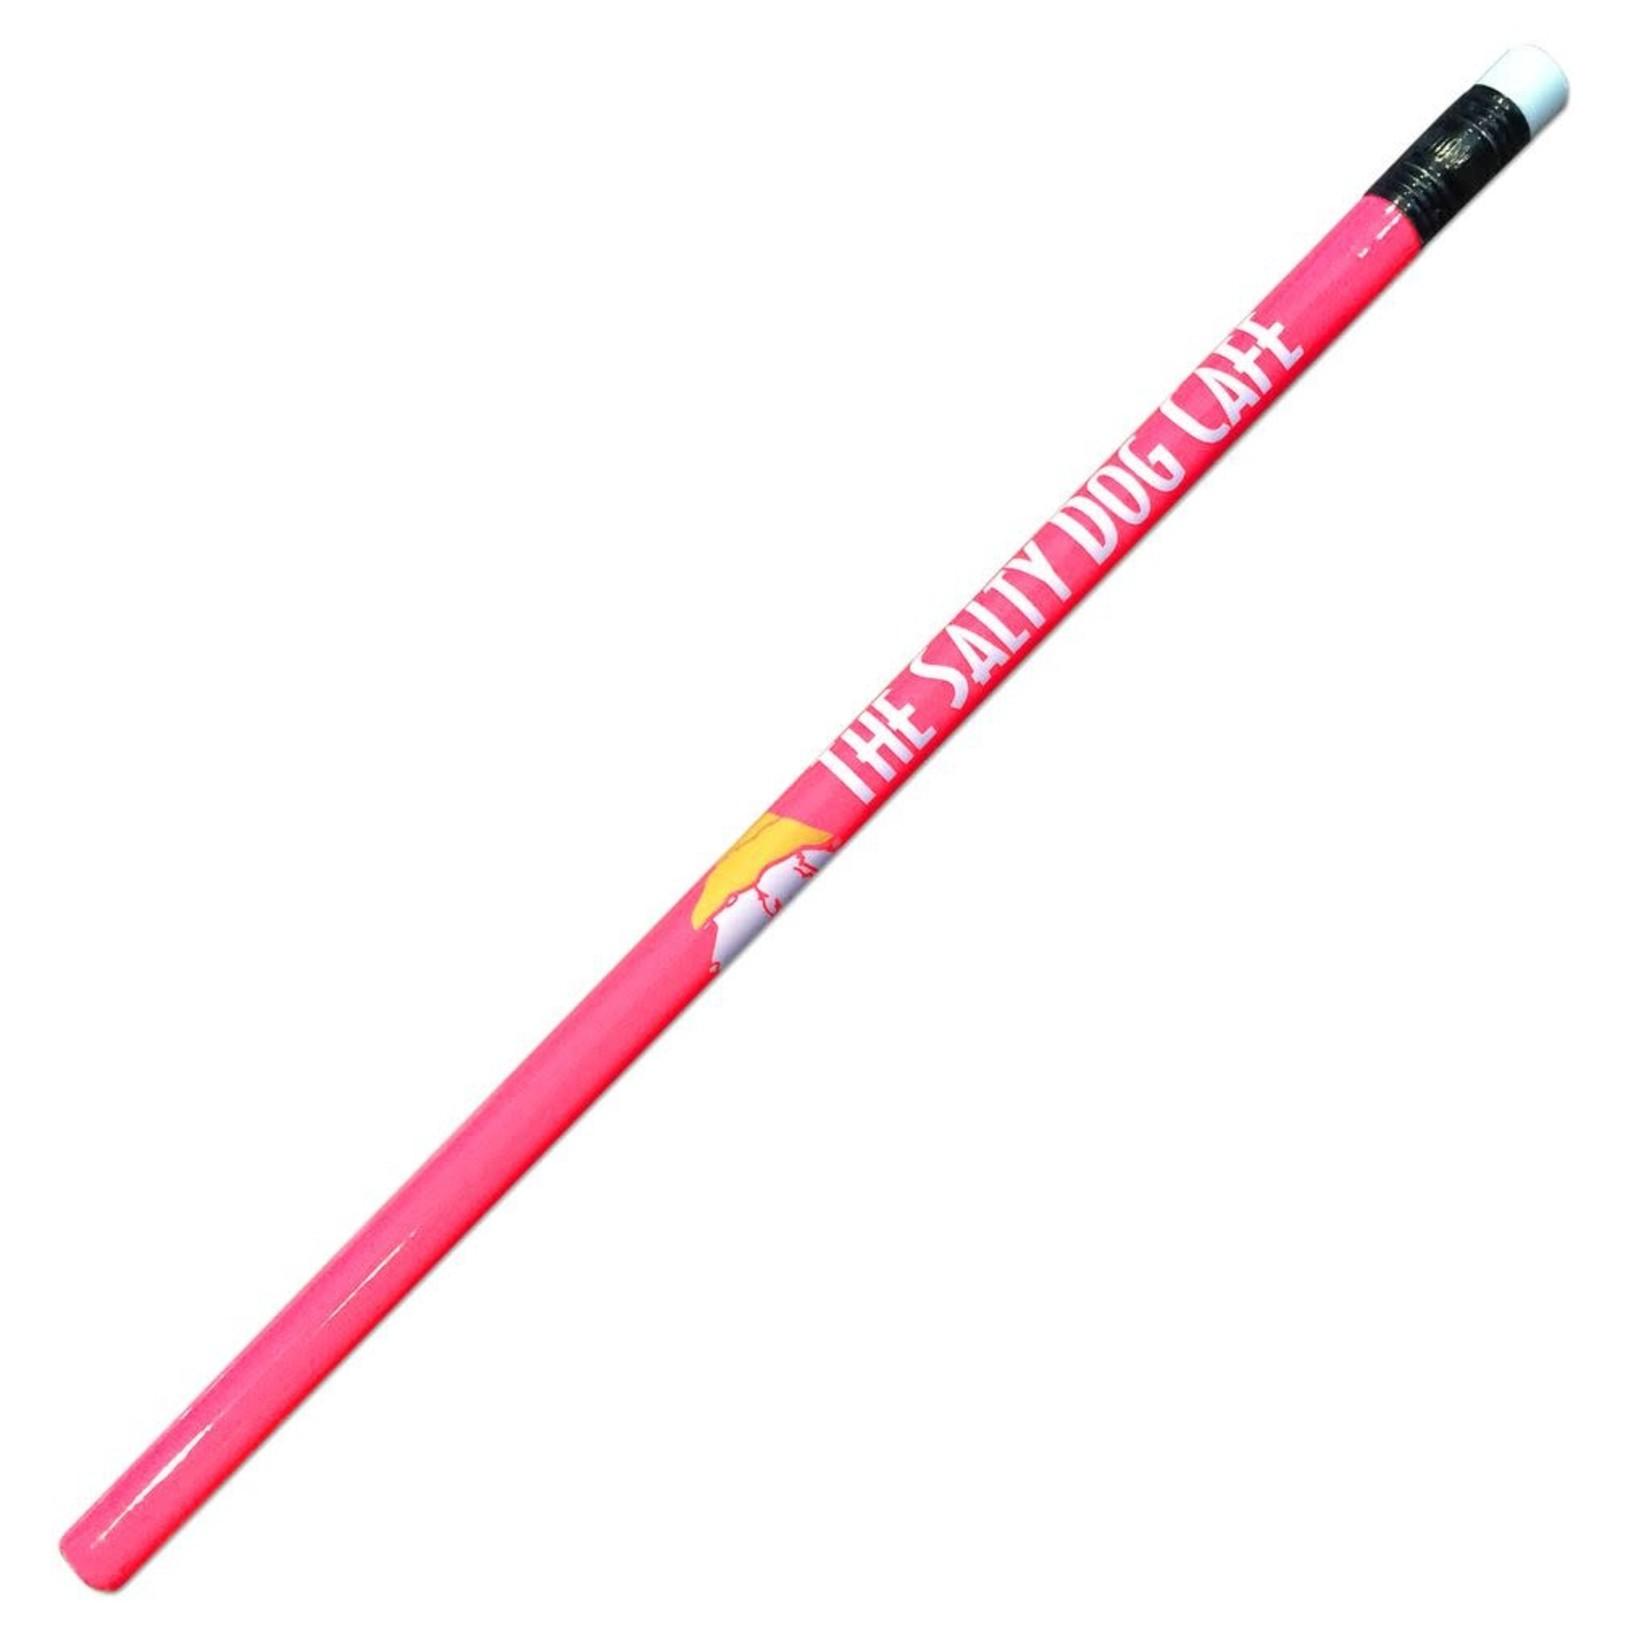 Pencil - Neon, Pink